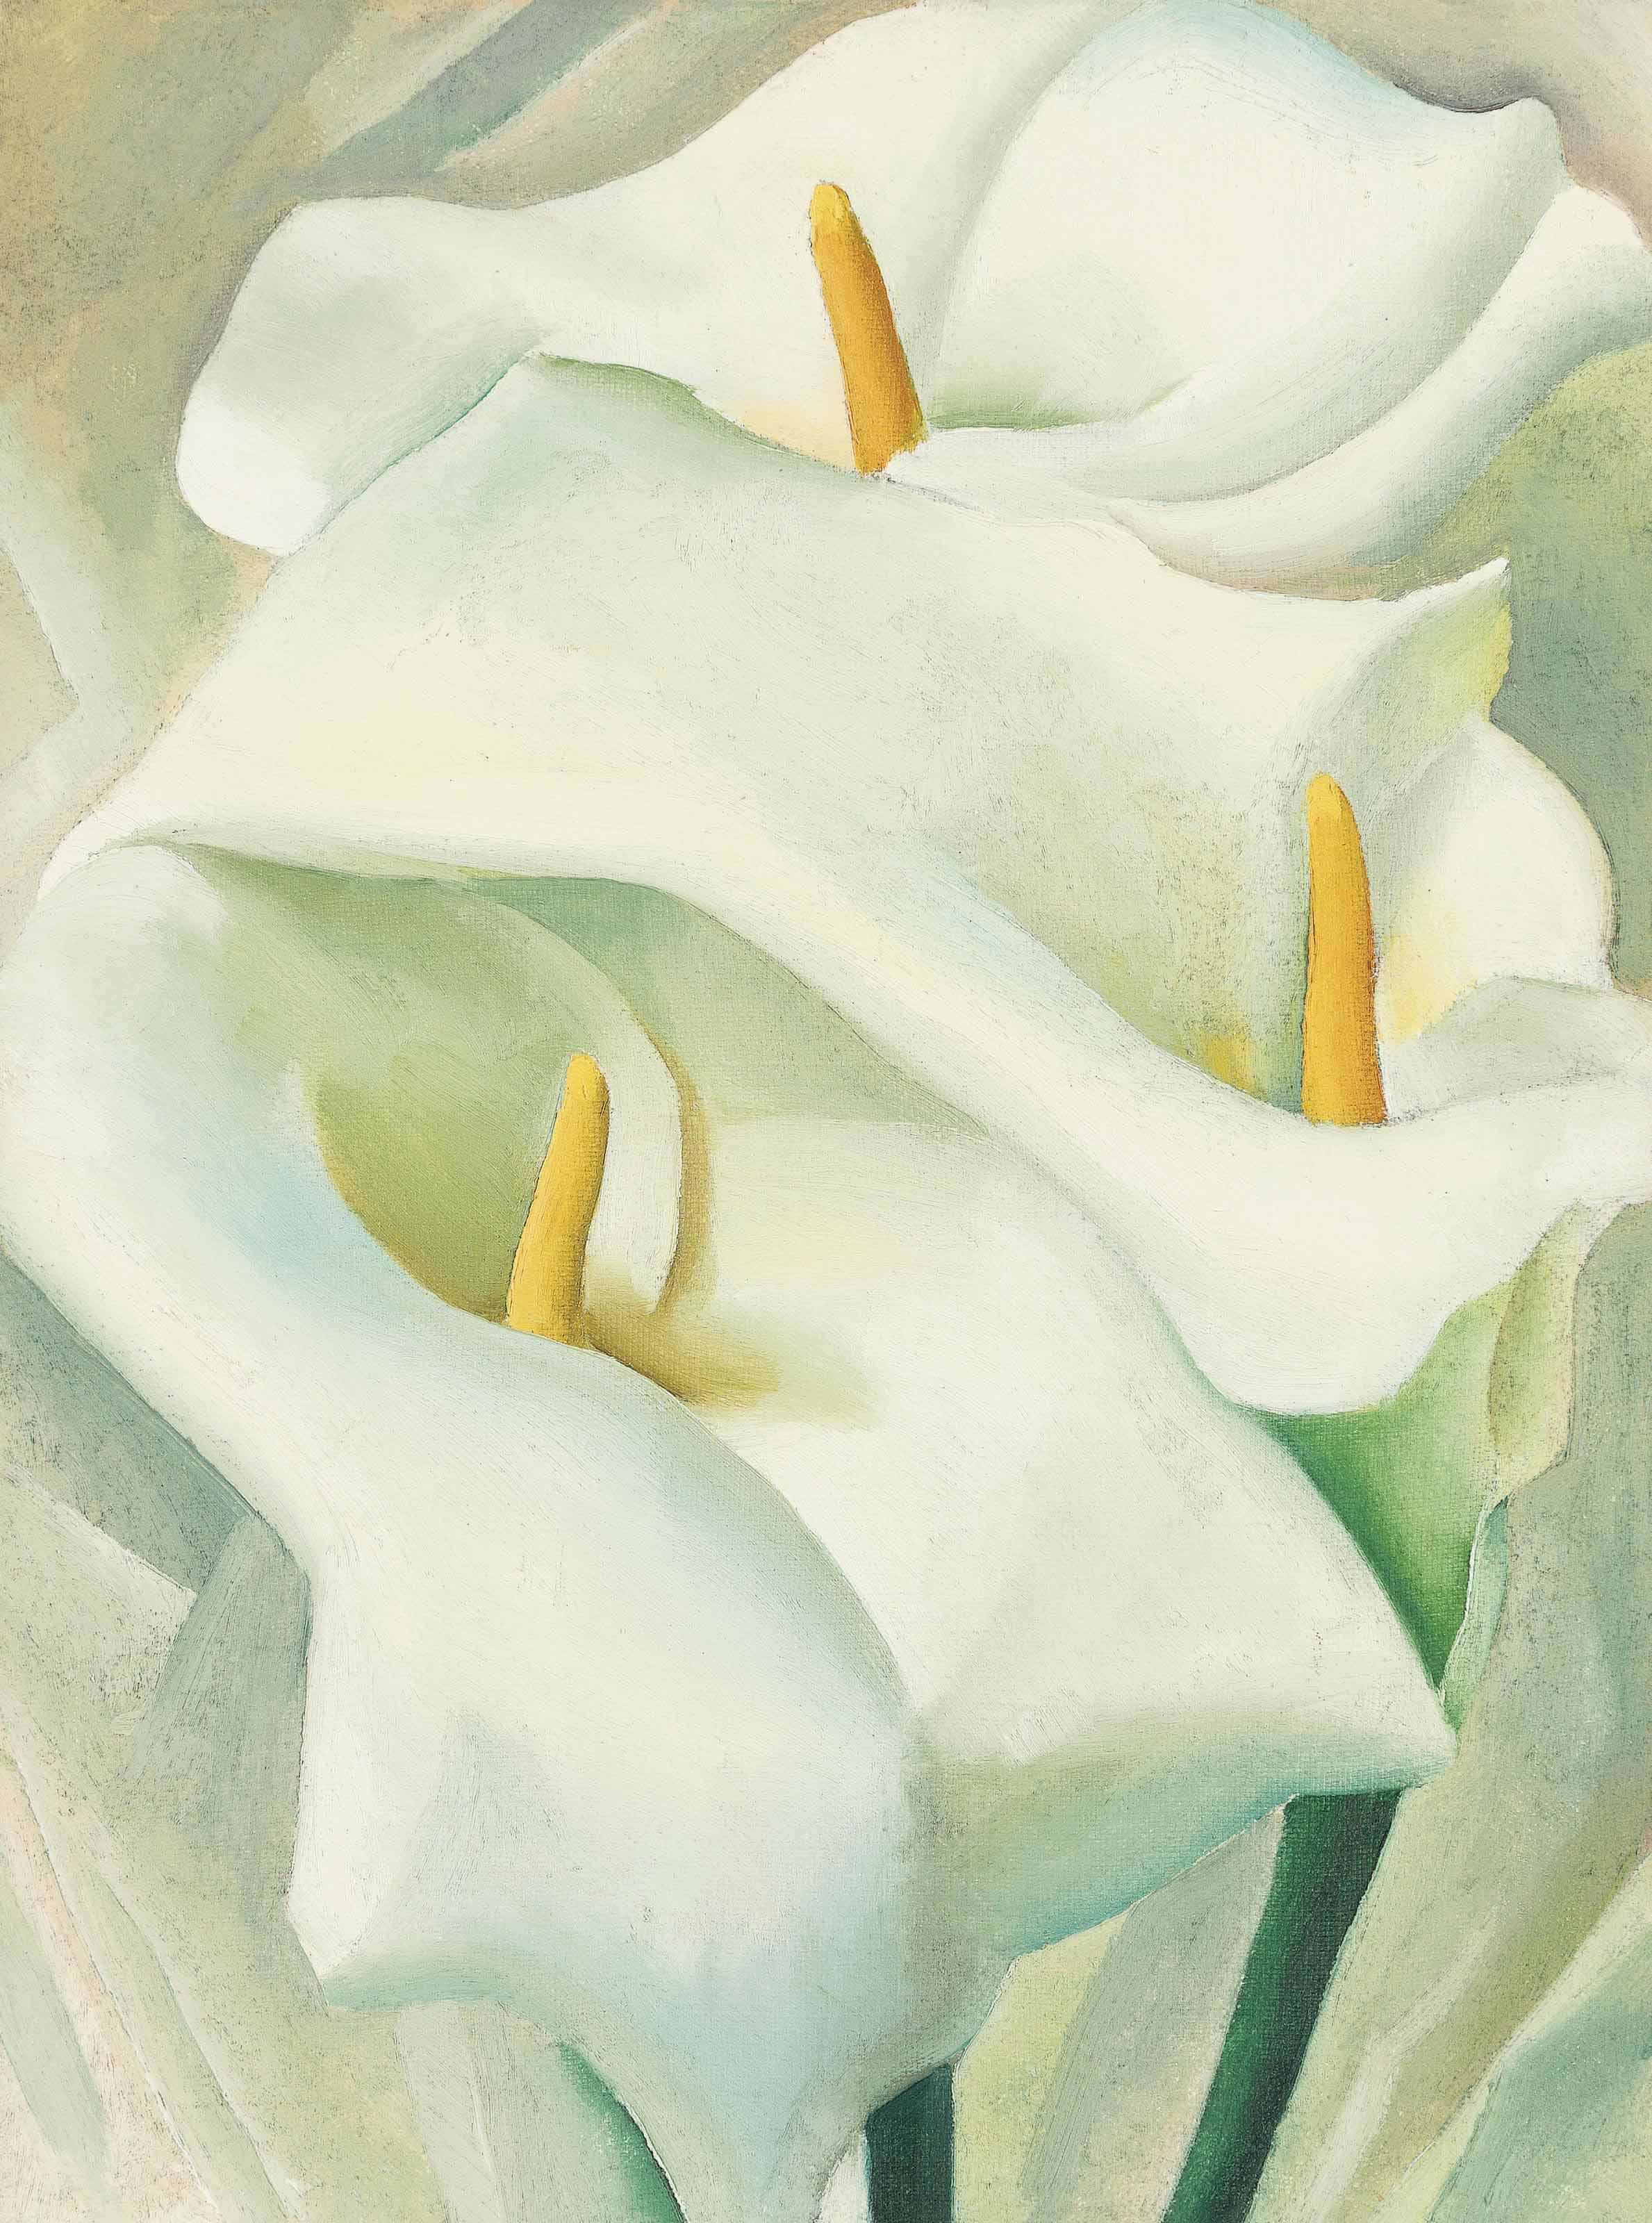 Audio: Georgia O'Keeffe, Calla Lilies